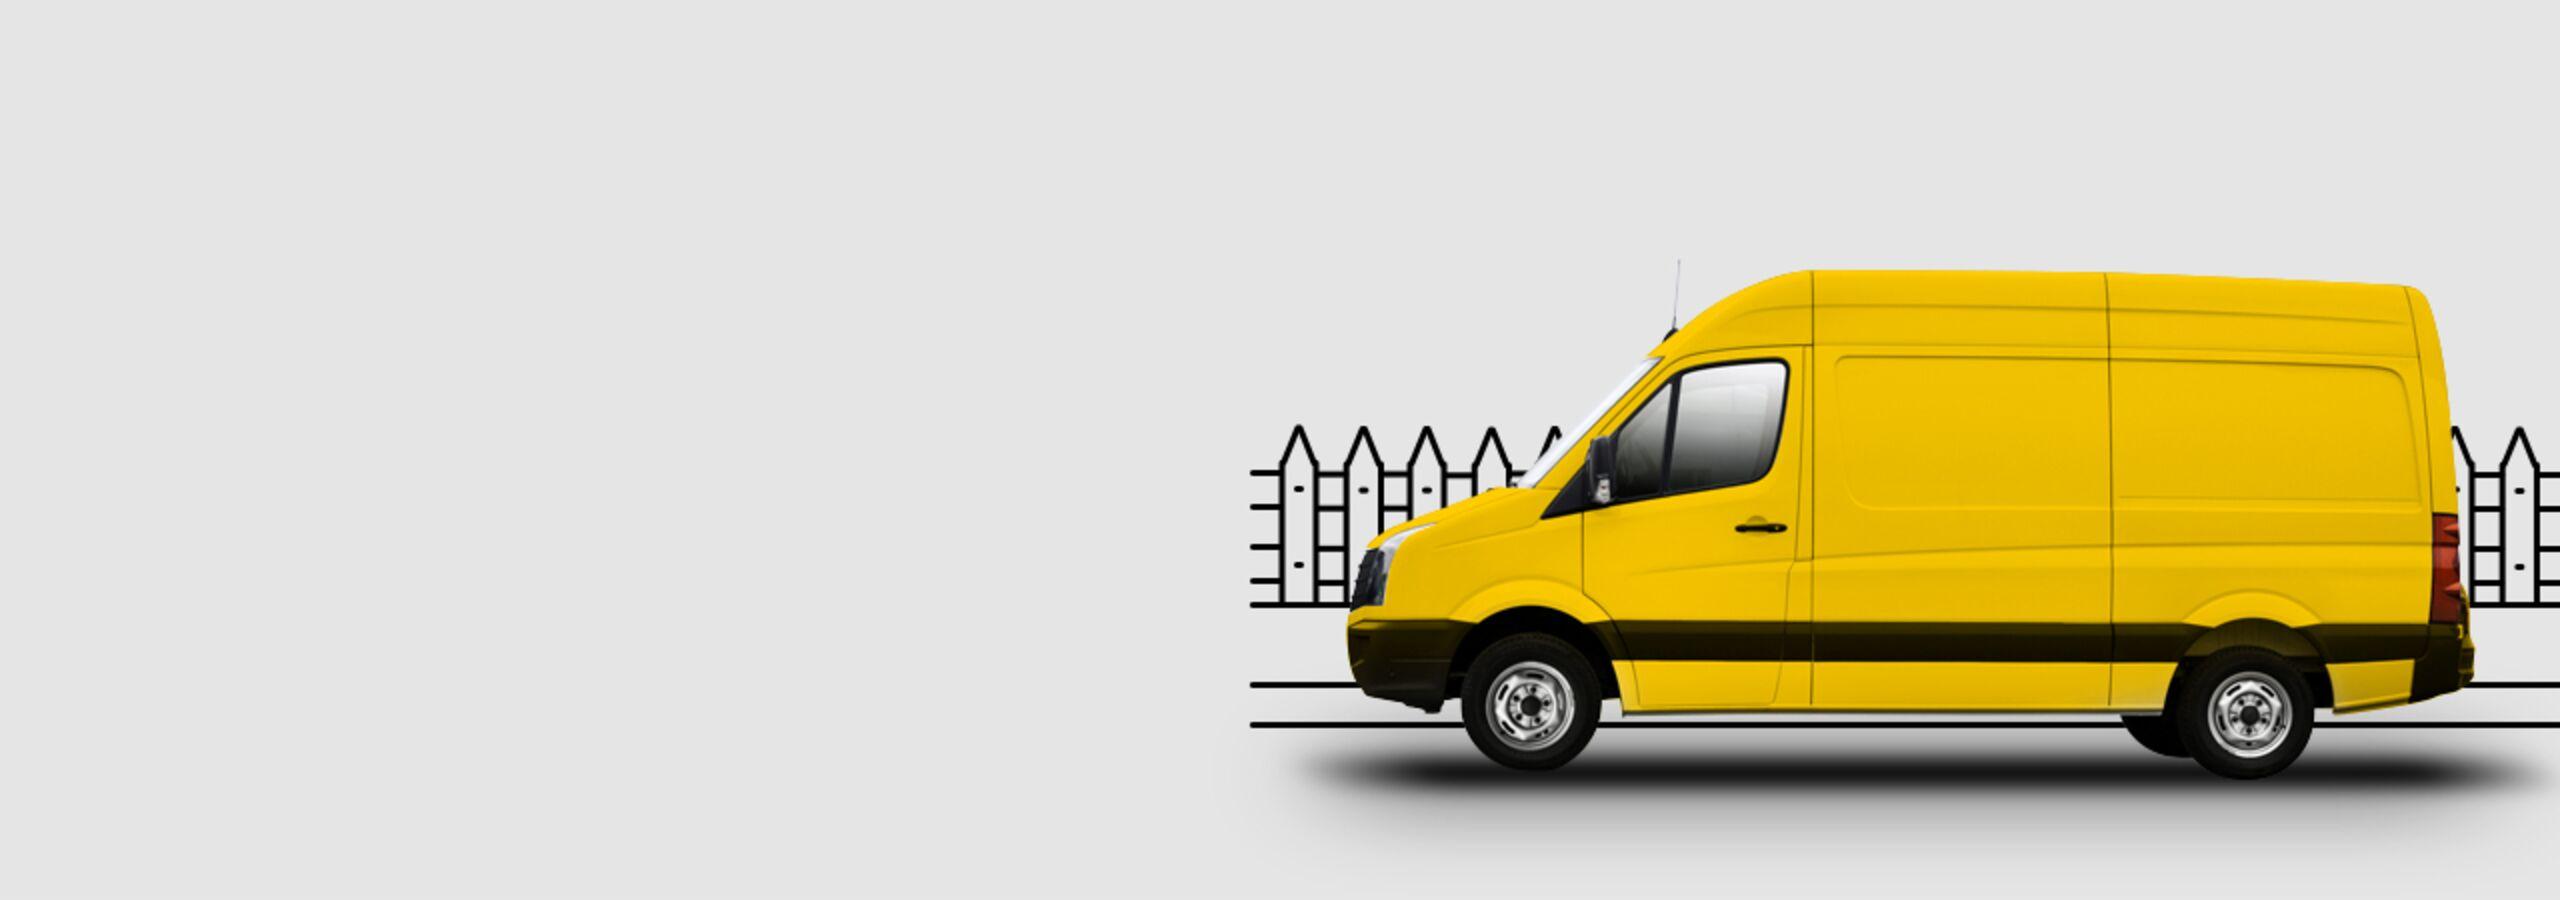 Gelber Umzugswagen